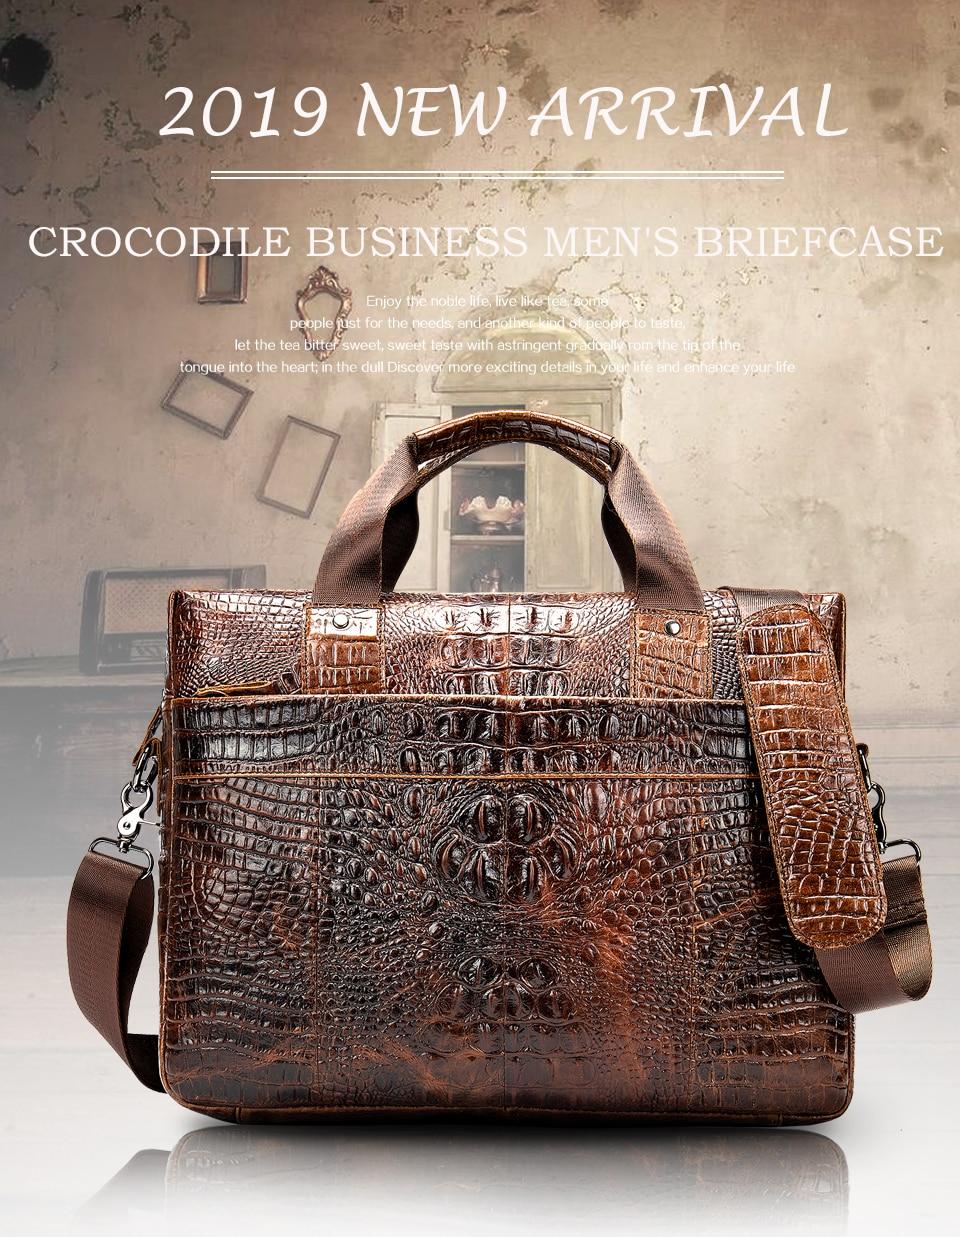 H1606f060cd404b0aad7f7ab208817dbeq WESTAL Men Briefcase Men's Bag Genuine Leather Office Bags for Men Laptop Bag Leather Briefcase Men Croco Design Computer Bags